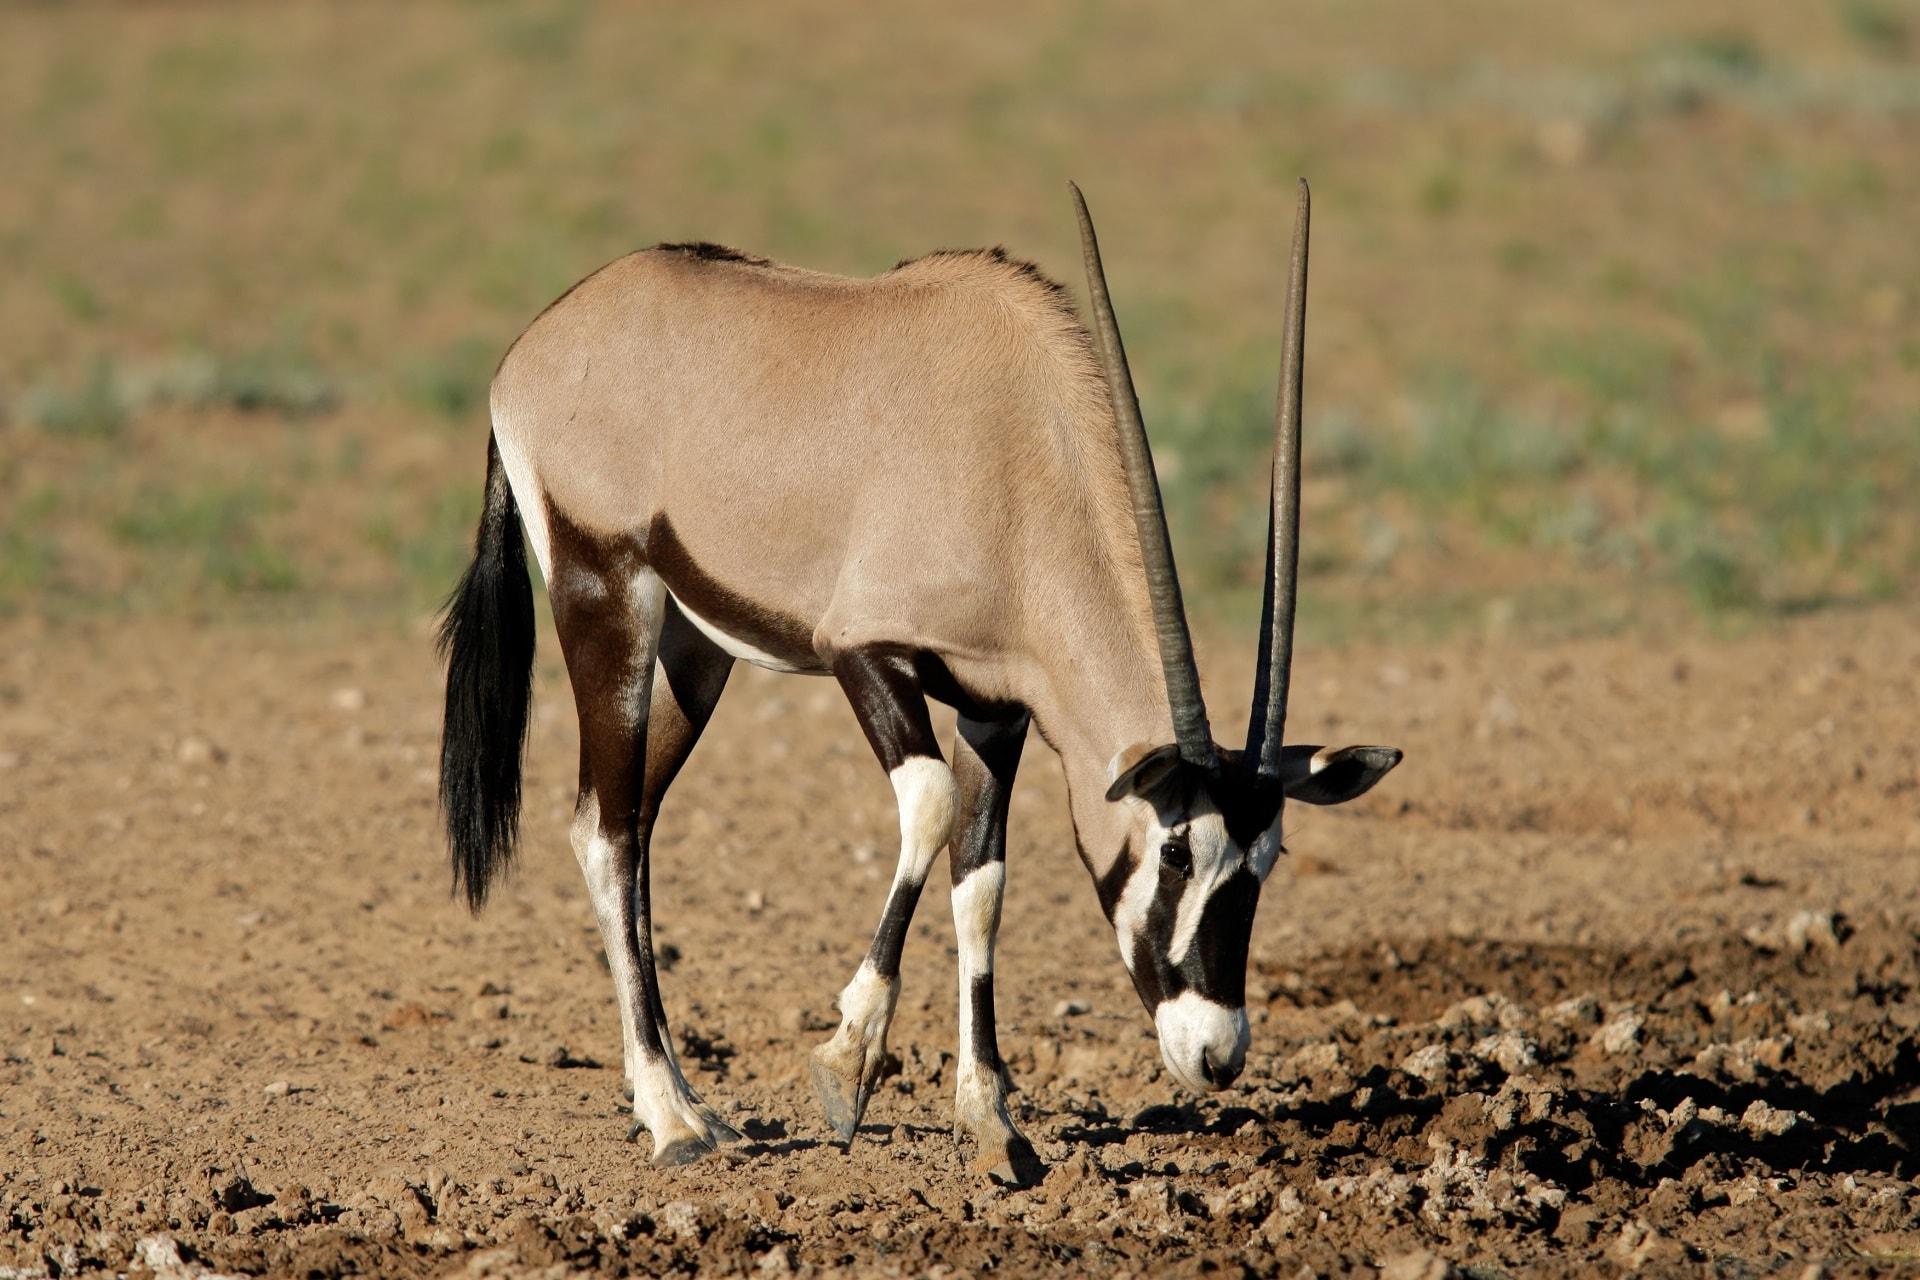 antelope dream meaning, dream about antelope, antelope dream interpretation, seeing in a dream antelope